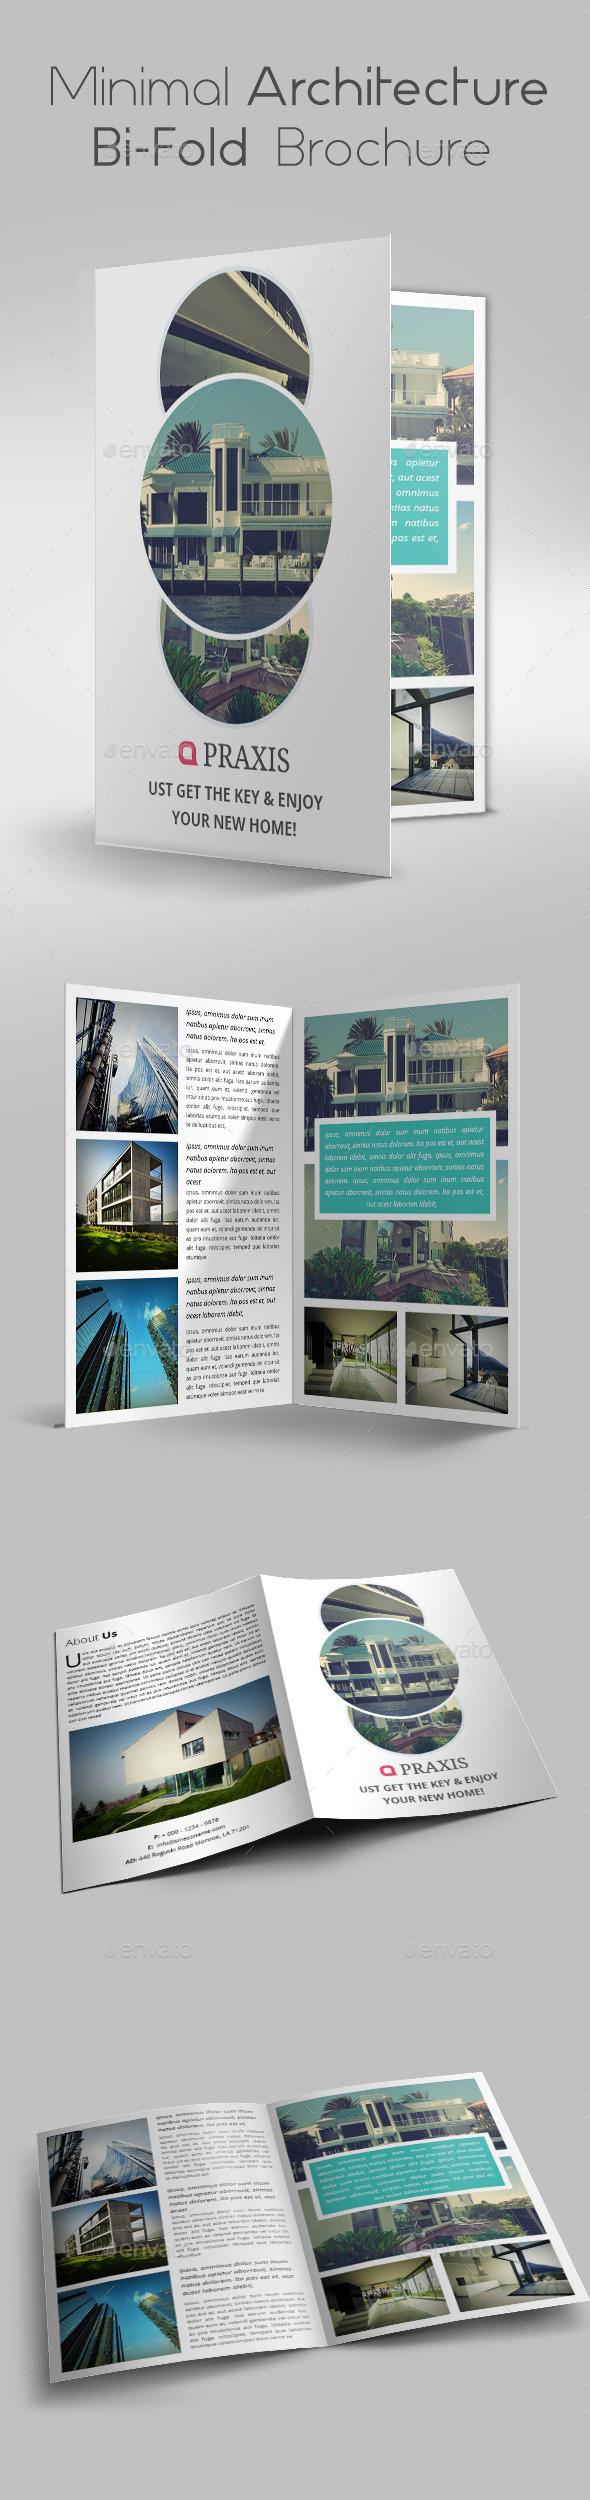 Minimal Architecture Bi-Fold Brochure  - Brochures Print Templates